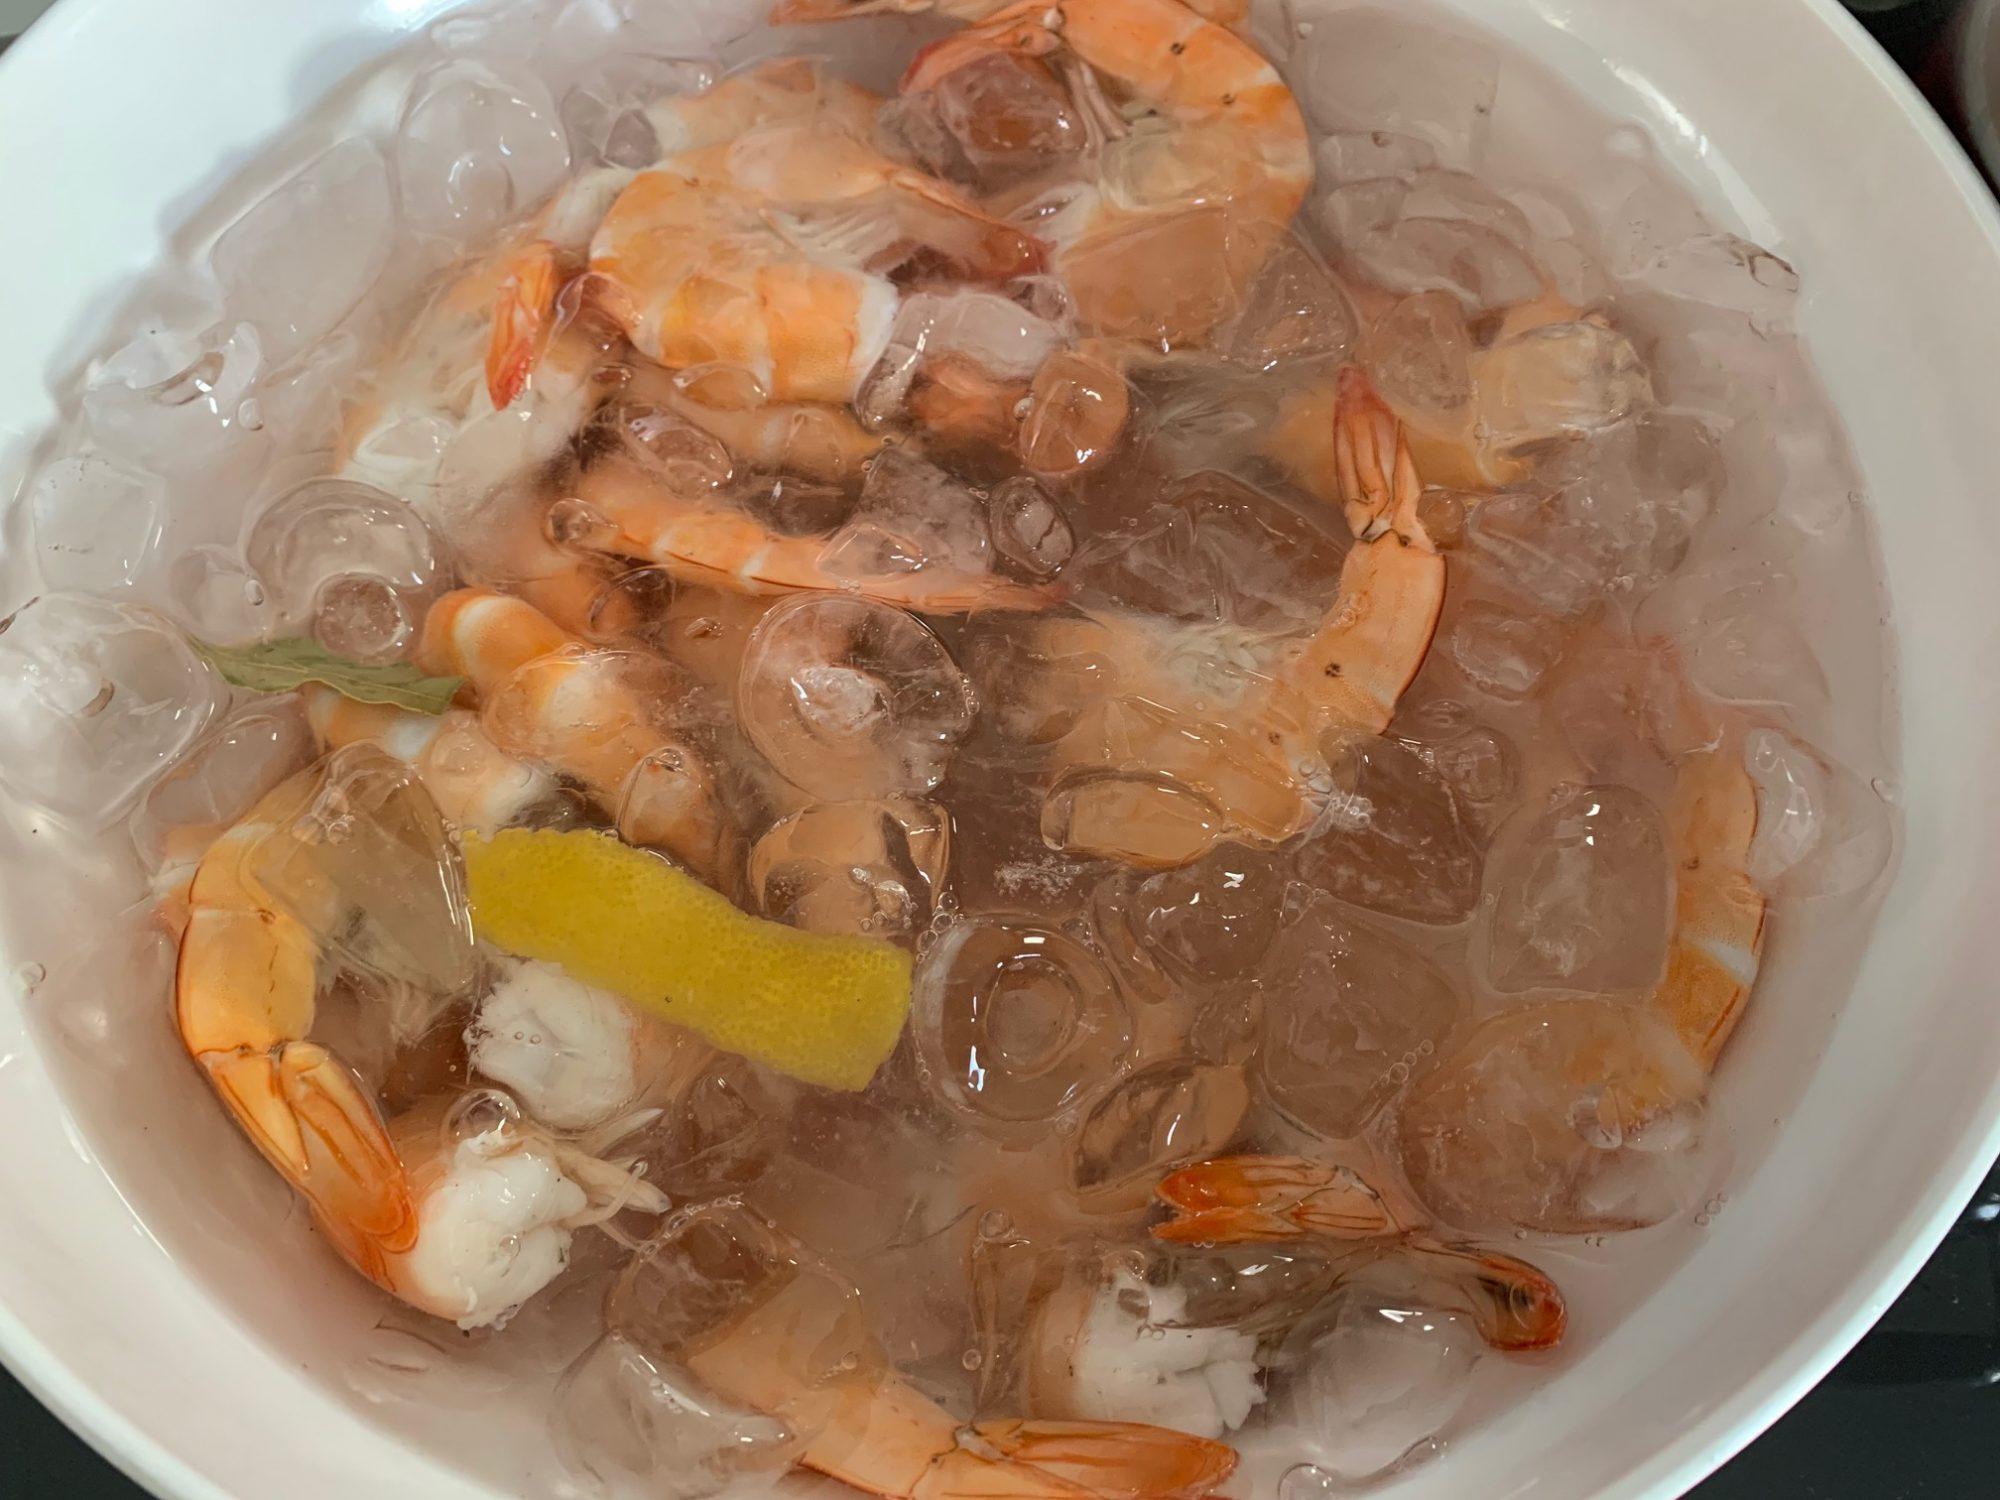 shrimp in ice water